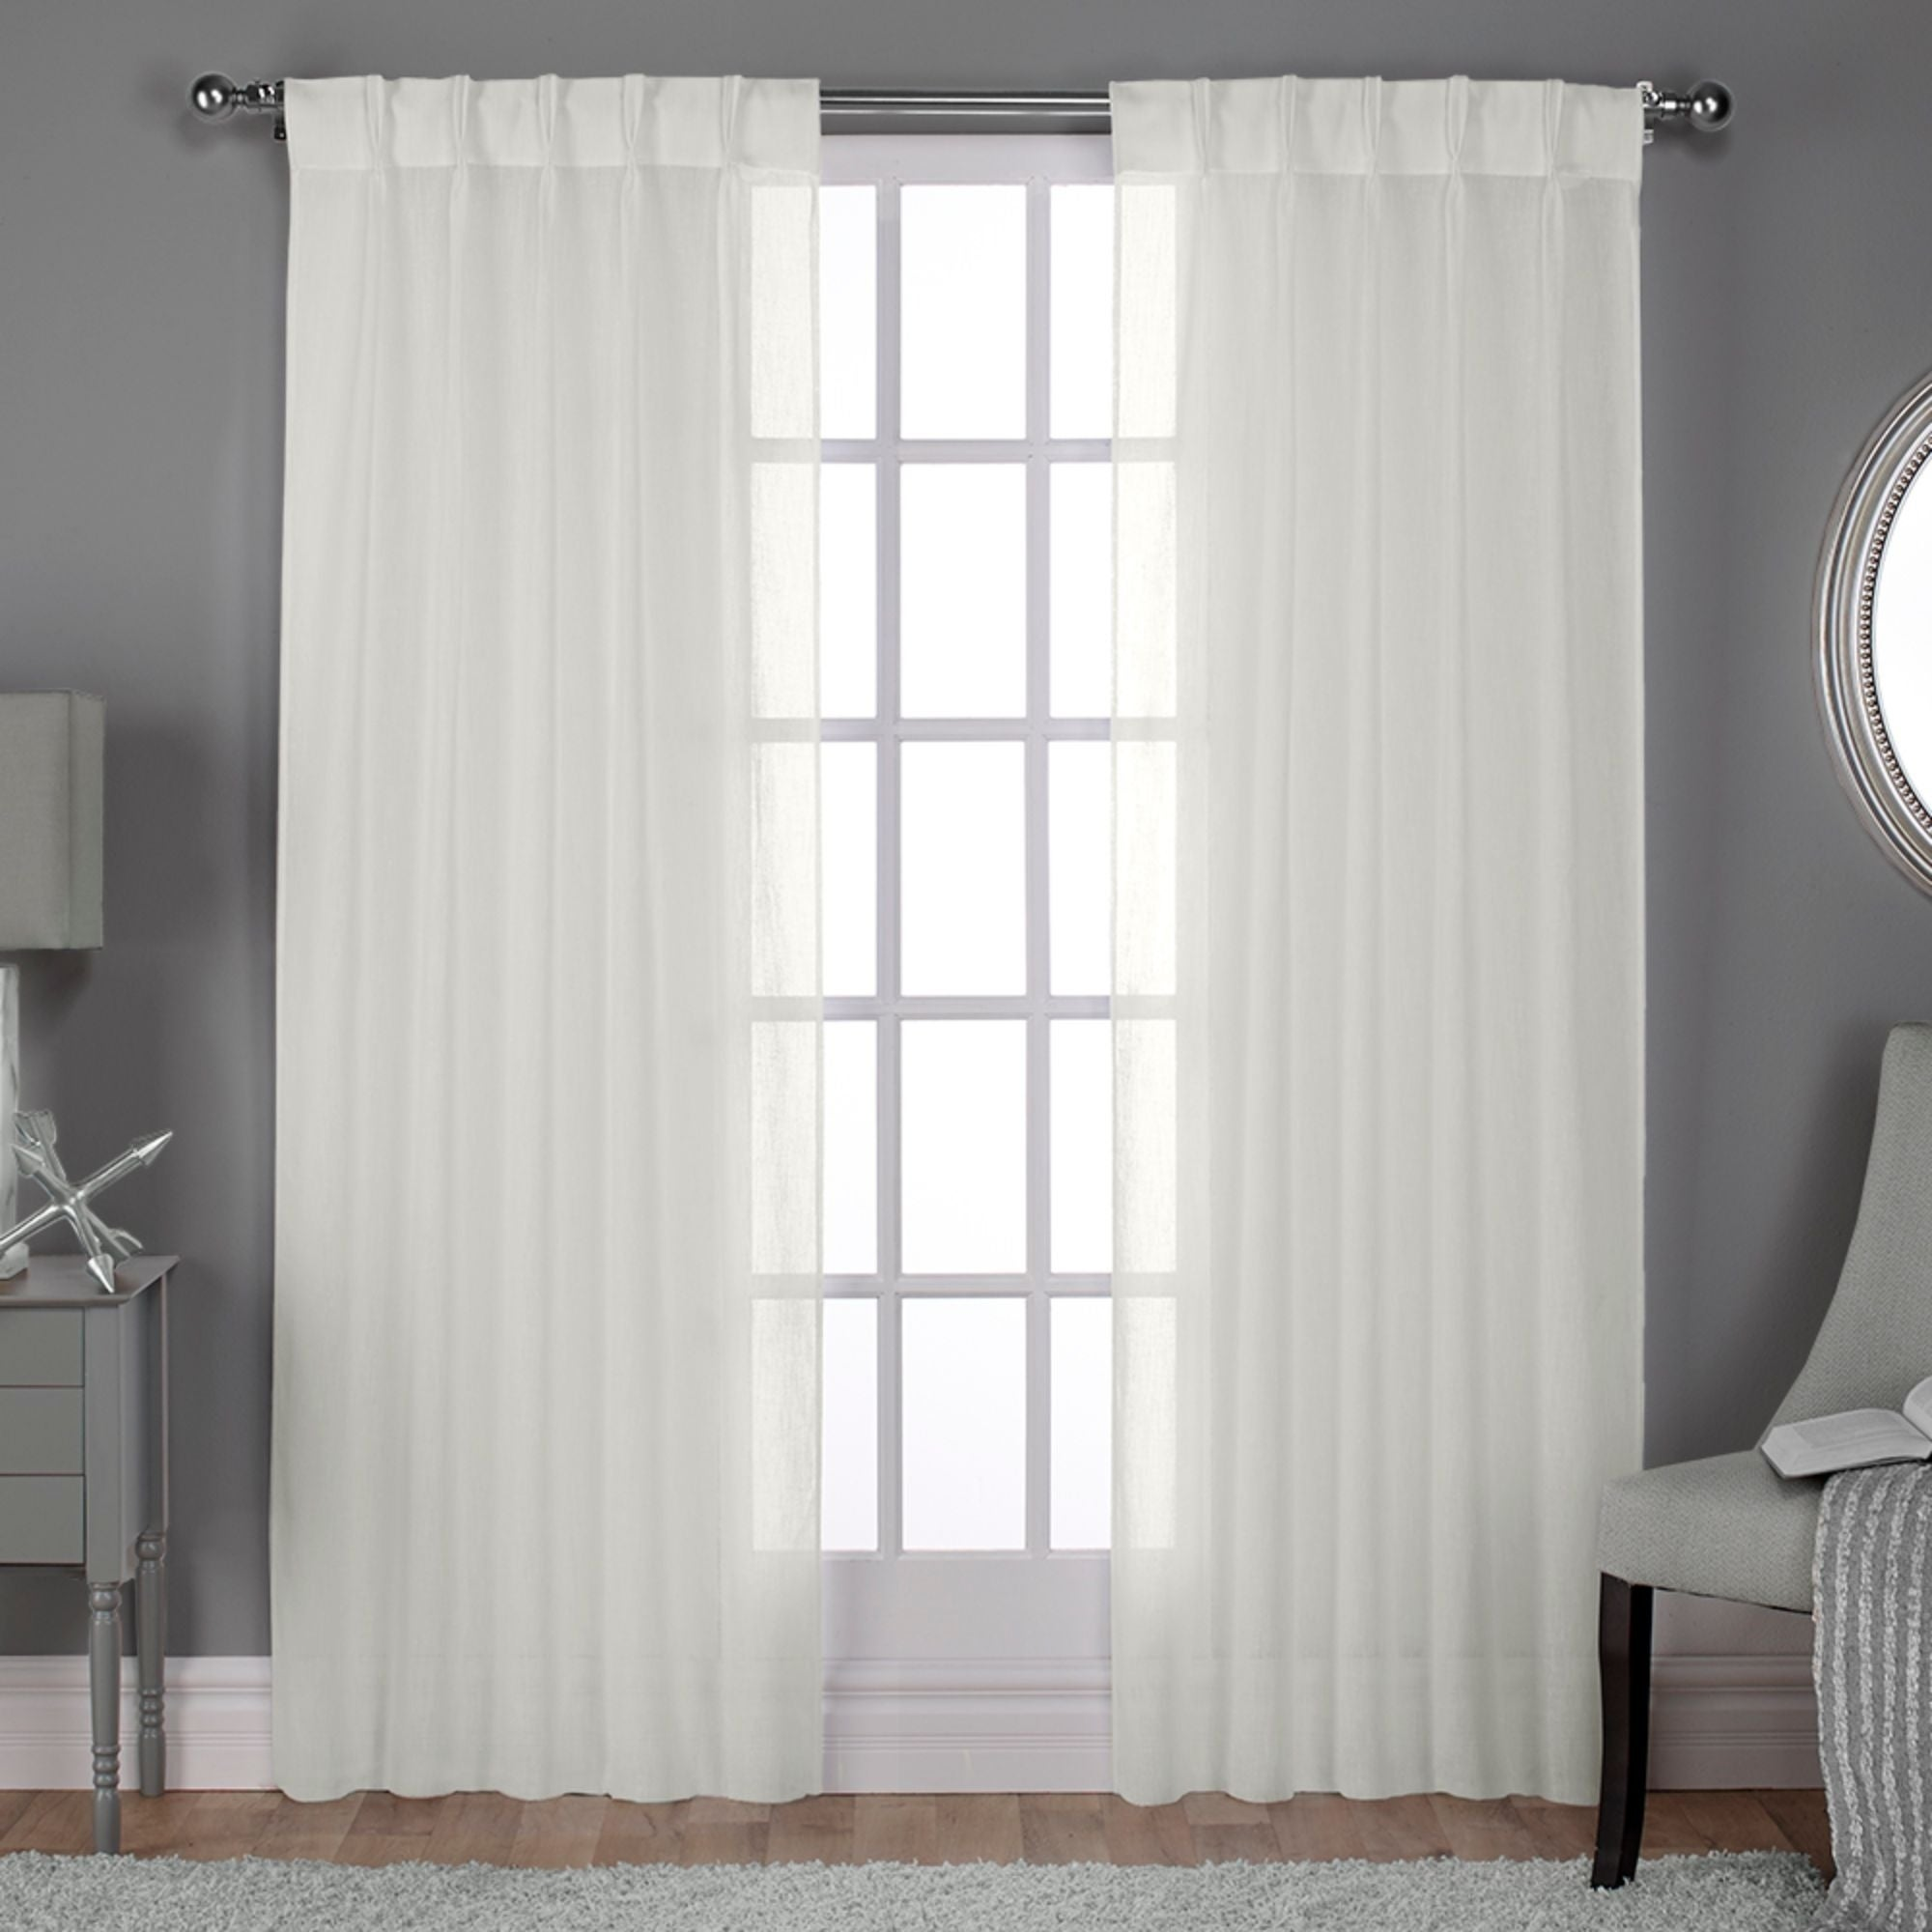 Ati Home Belgian Jacquard Sheer Double Pinch Pleat Top Curtain Panel Pair Overstock 18590734